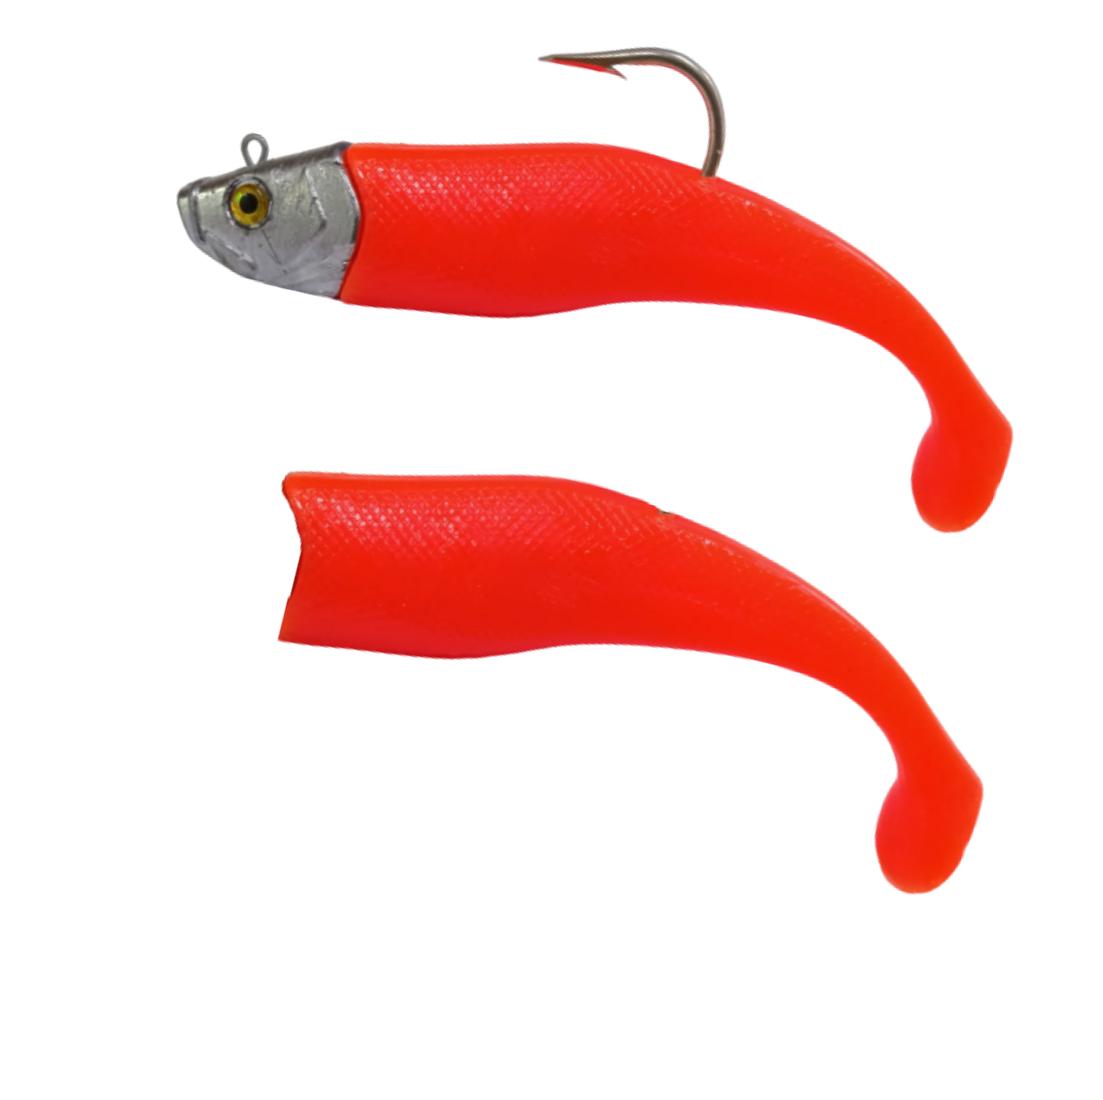 Isca Artificial Shad 400g 21cm Laranja Kruel